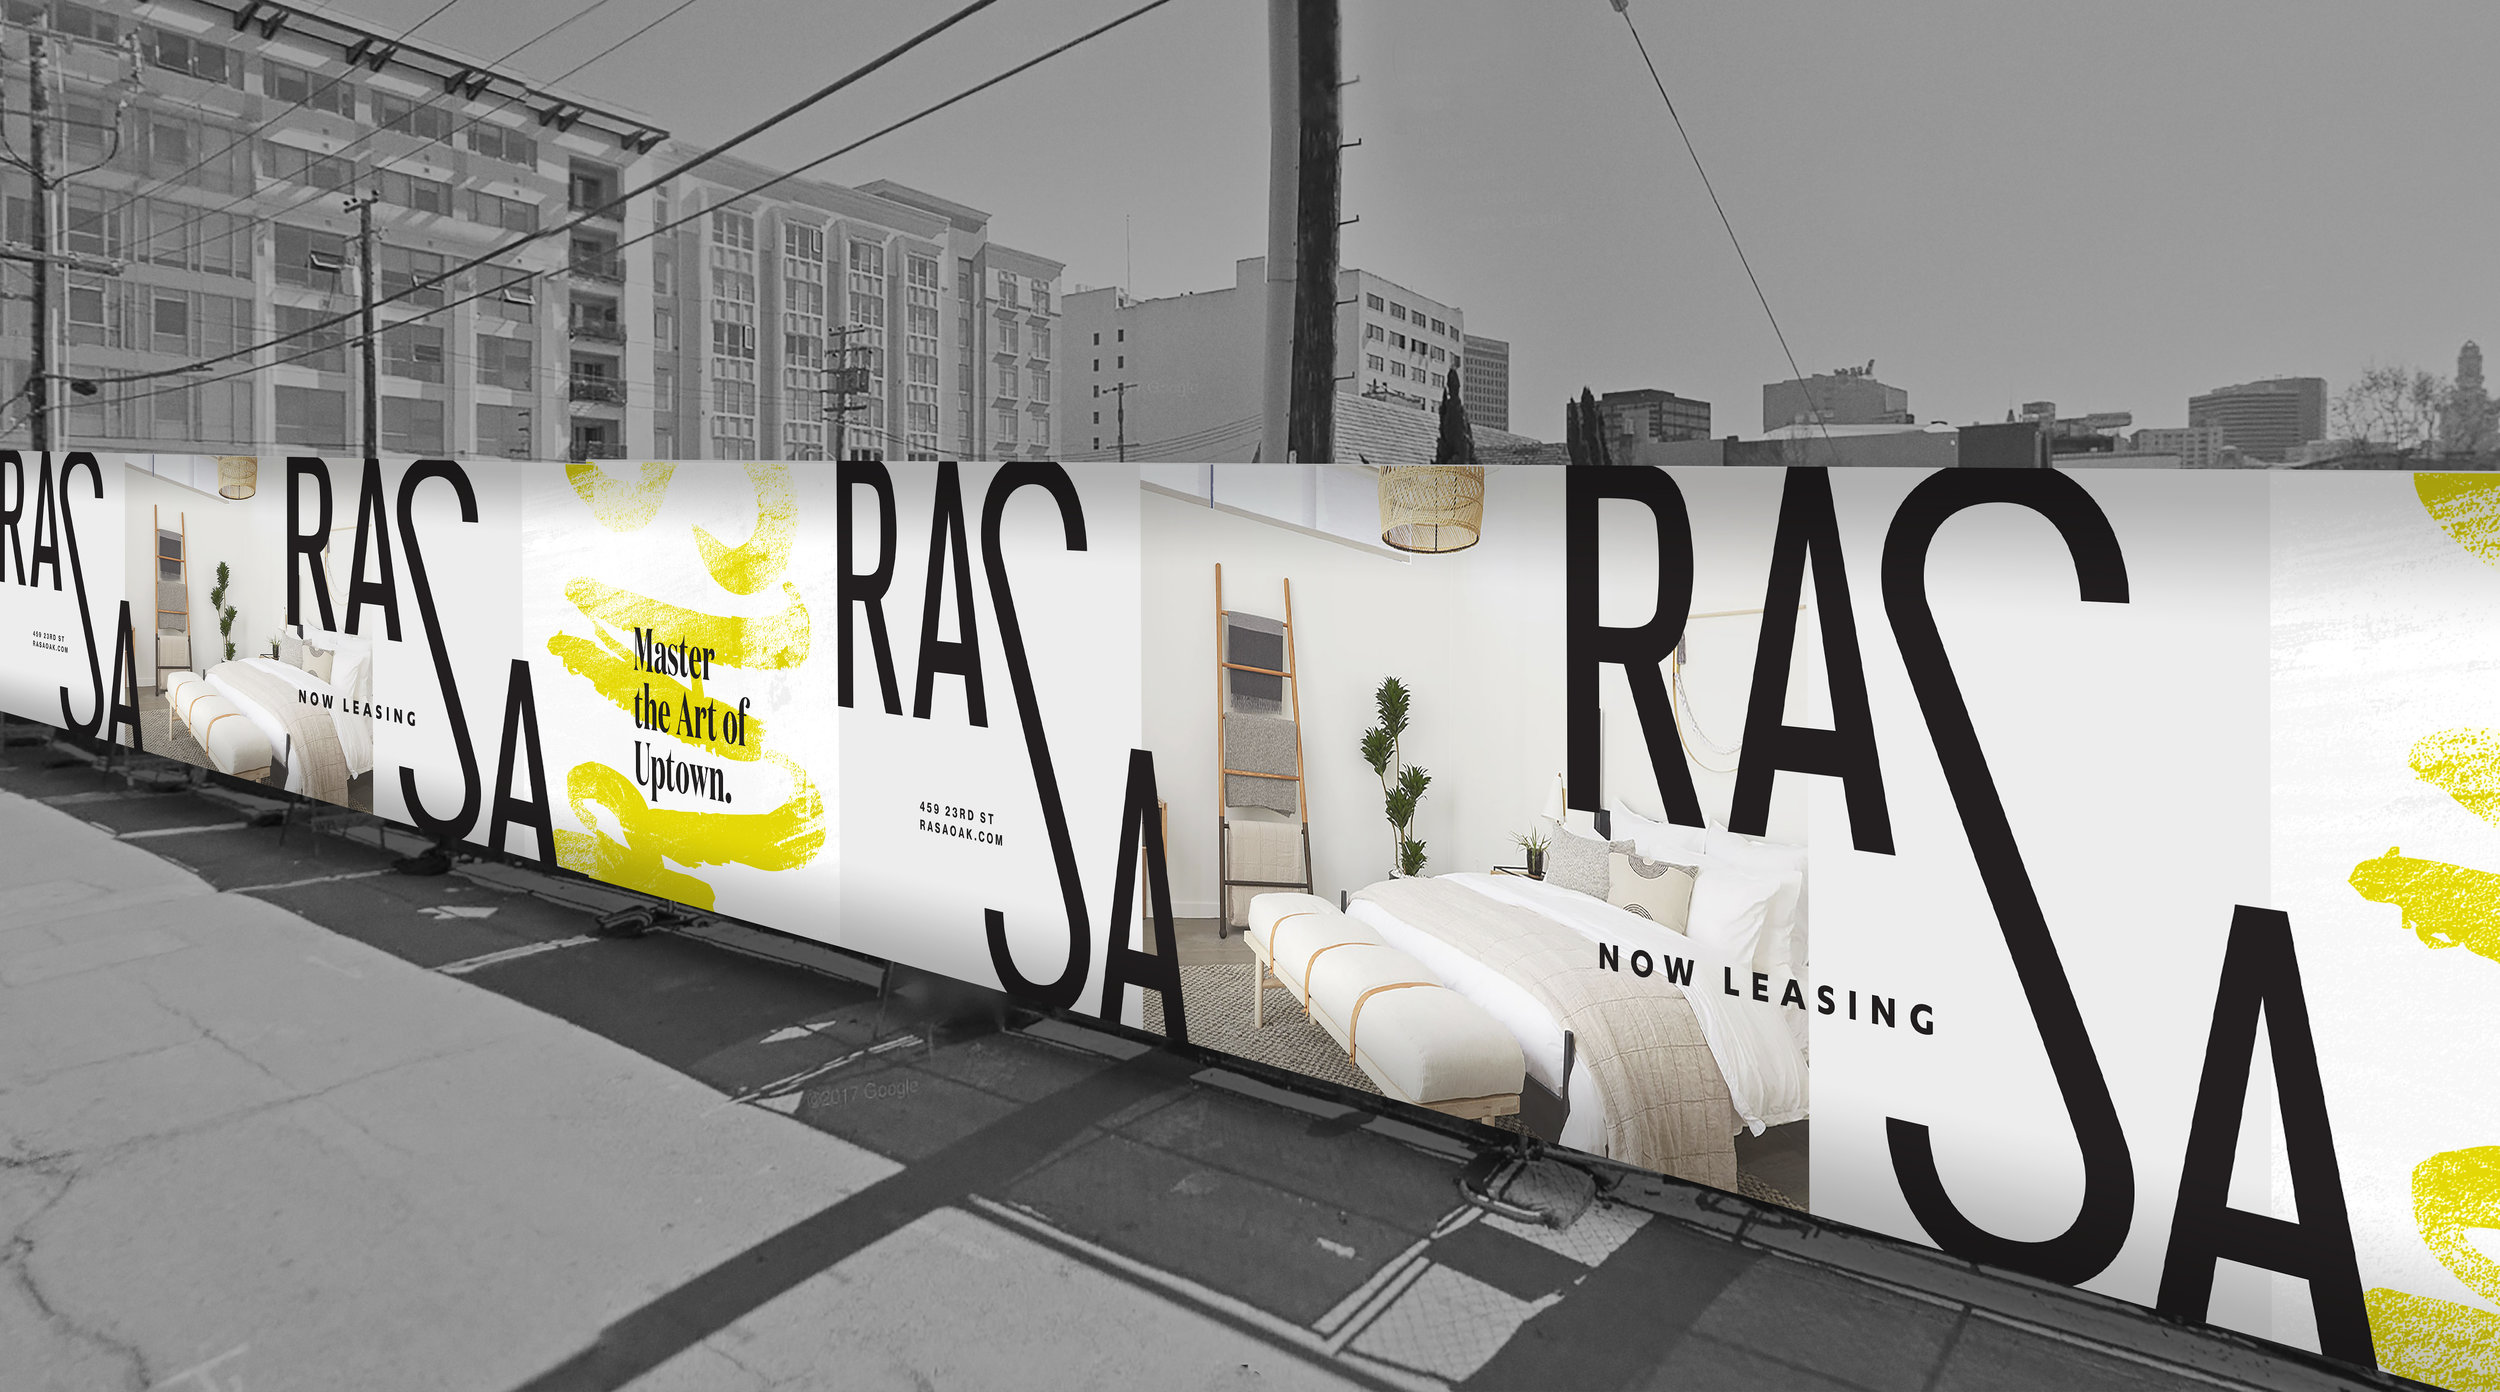 Rasa_ConstructionSignage2.jpg